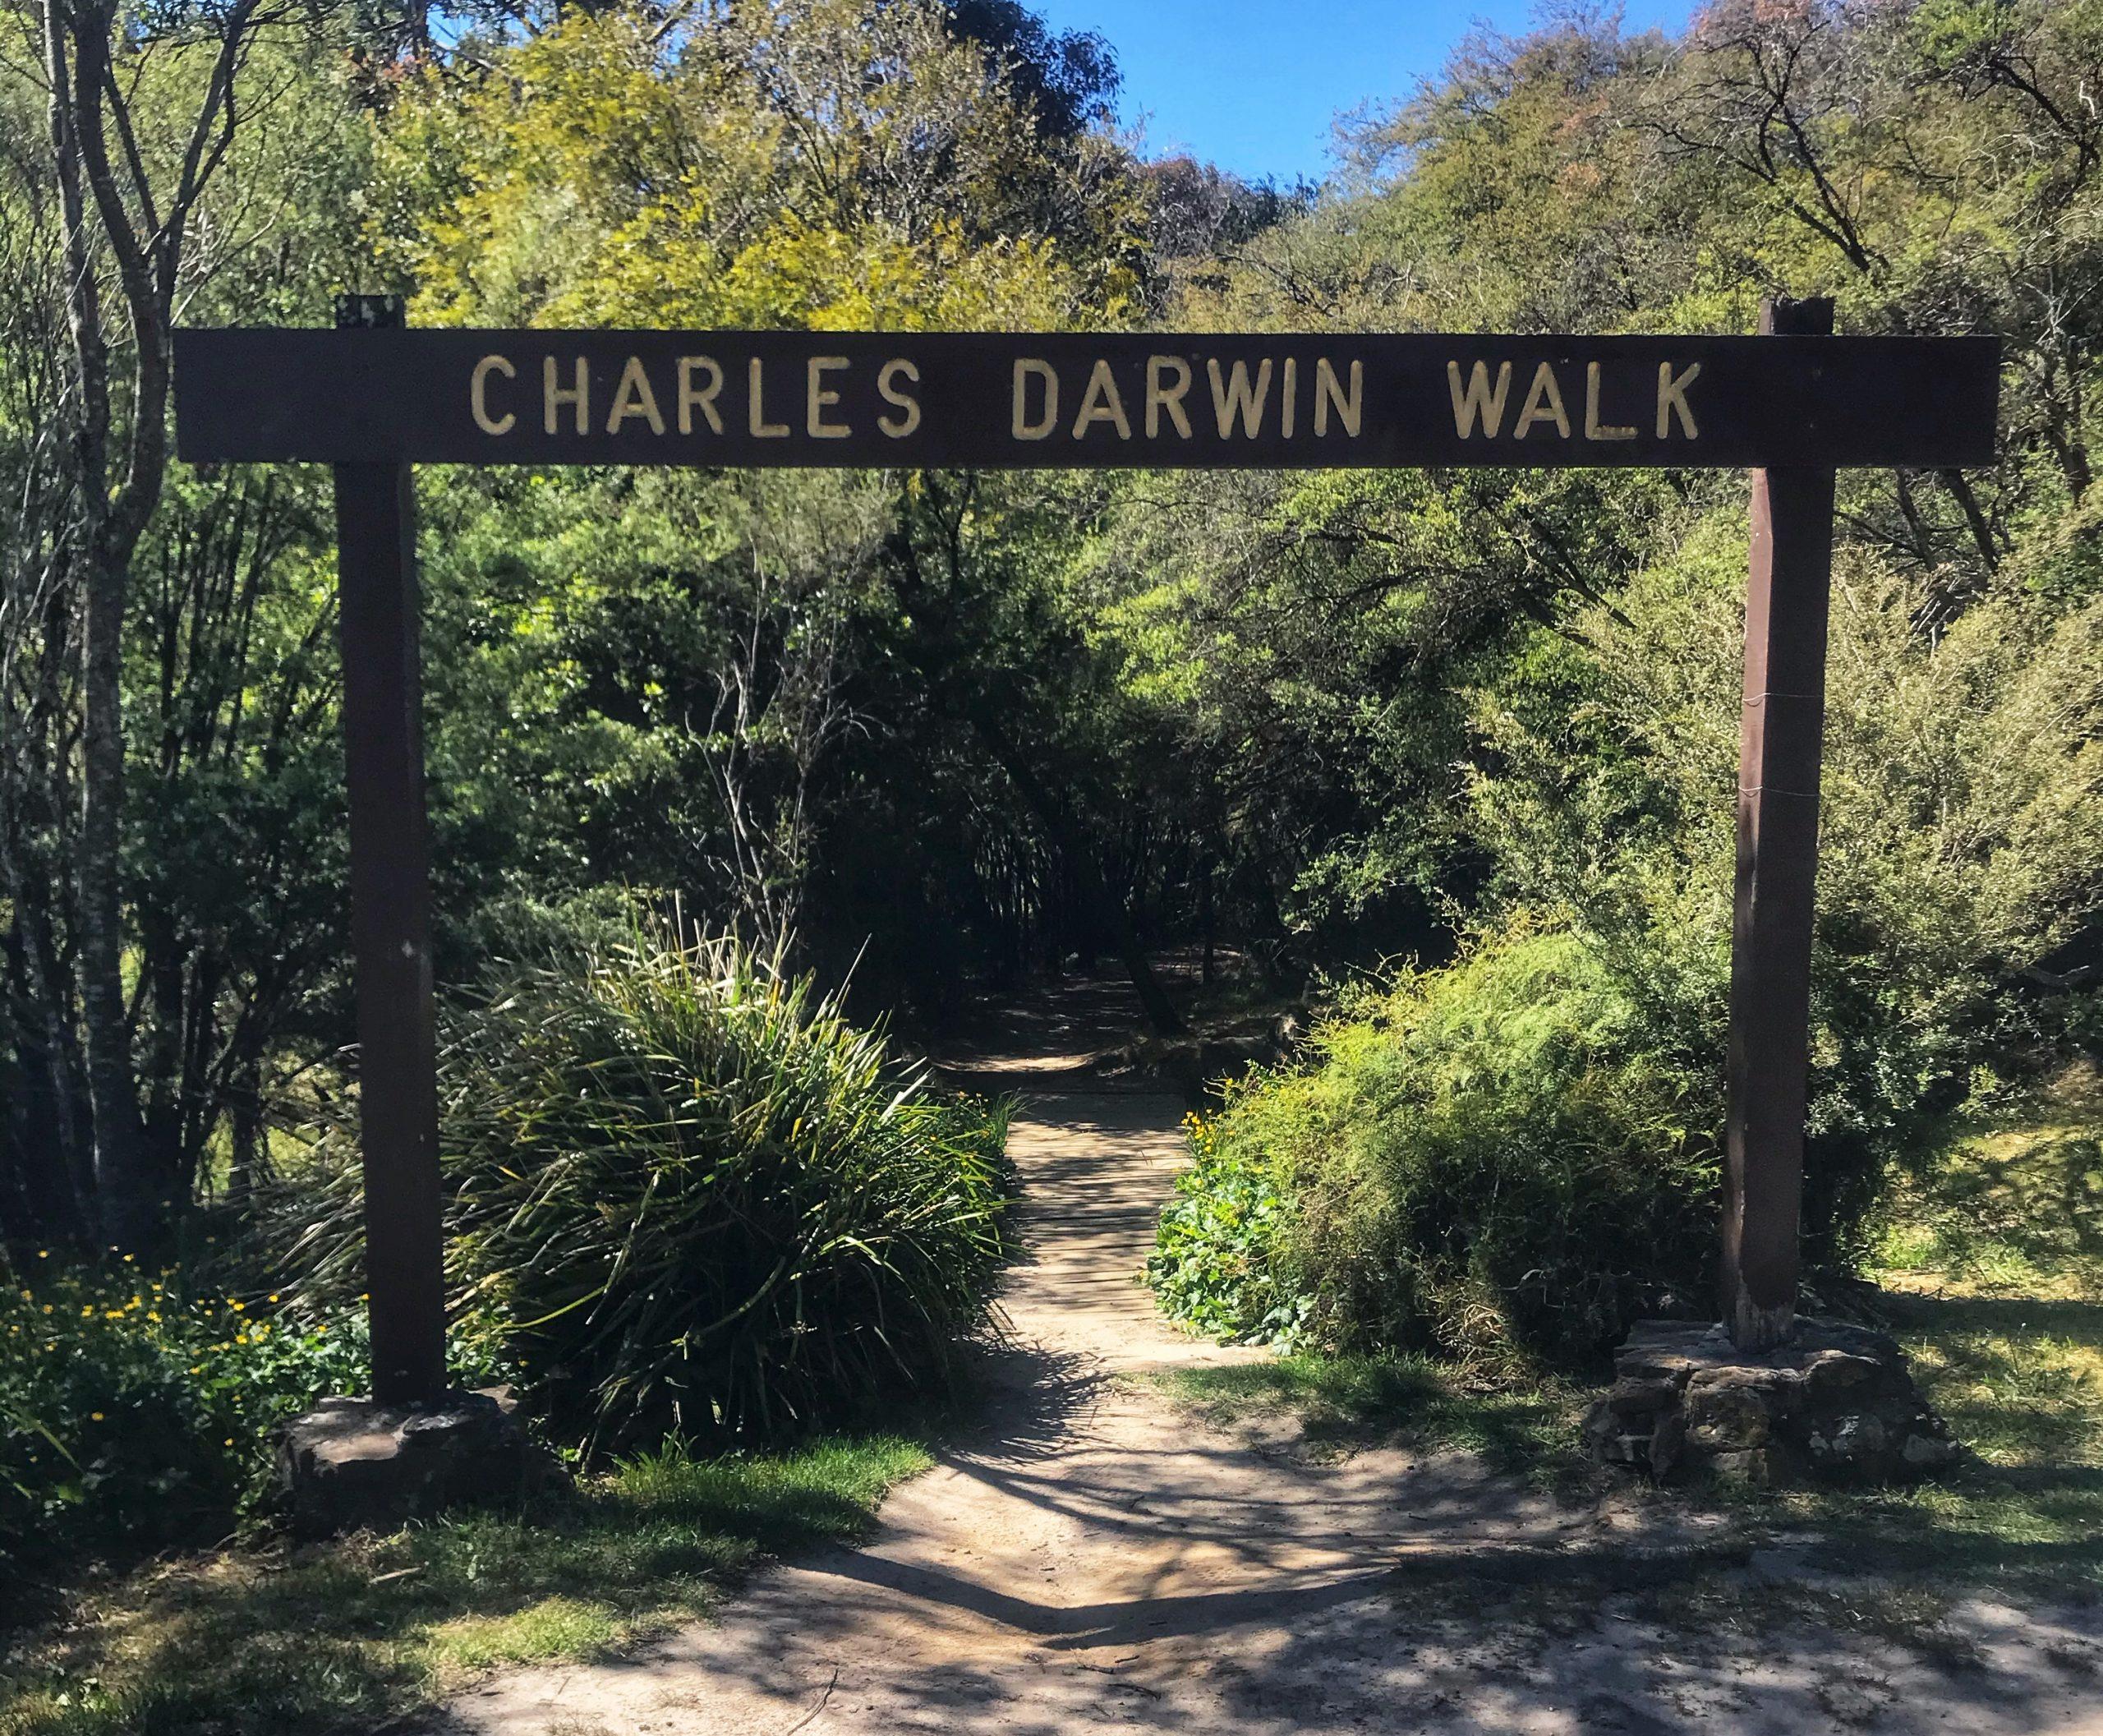 Charles Darwin Walk